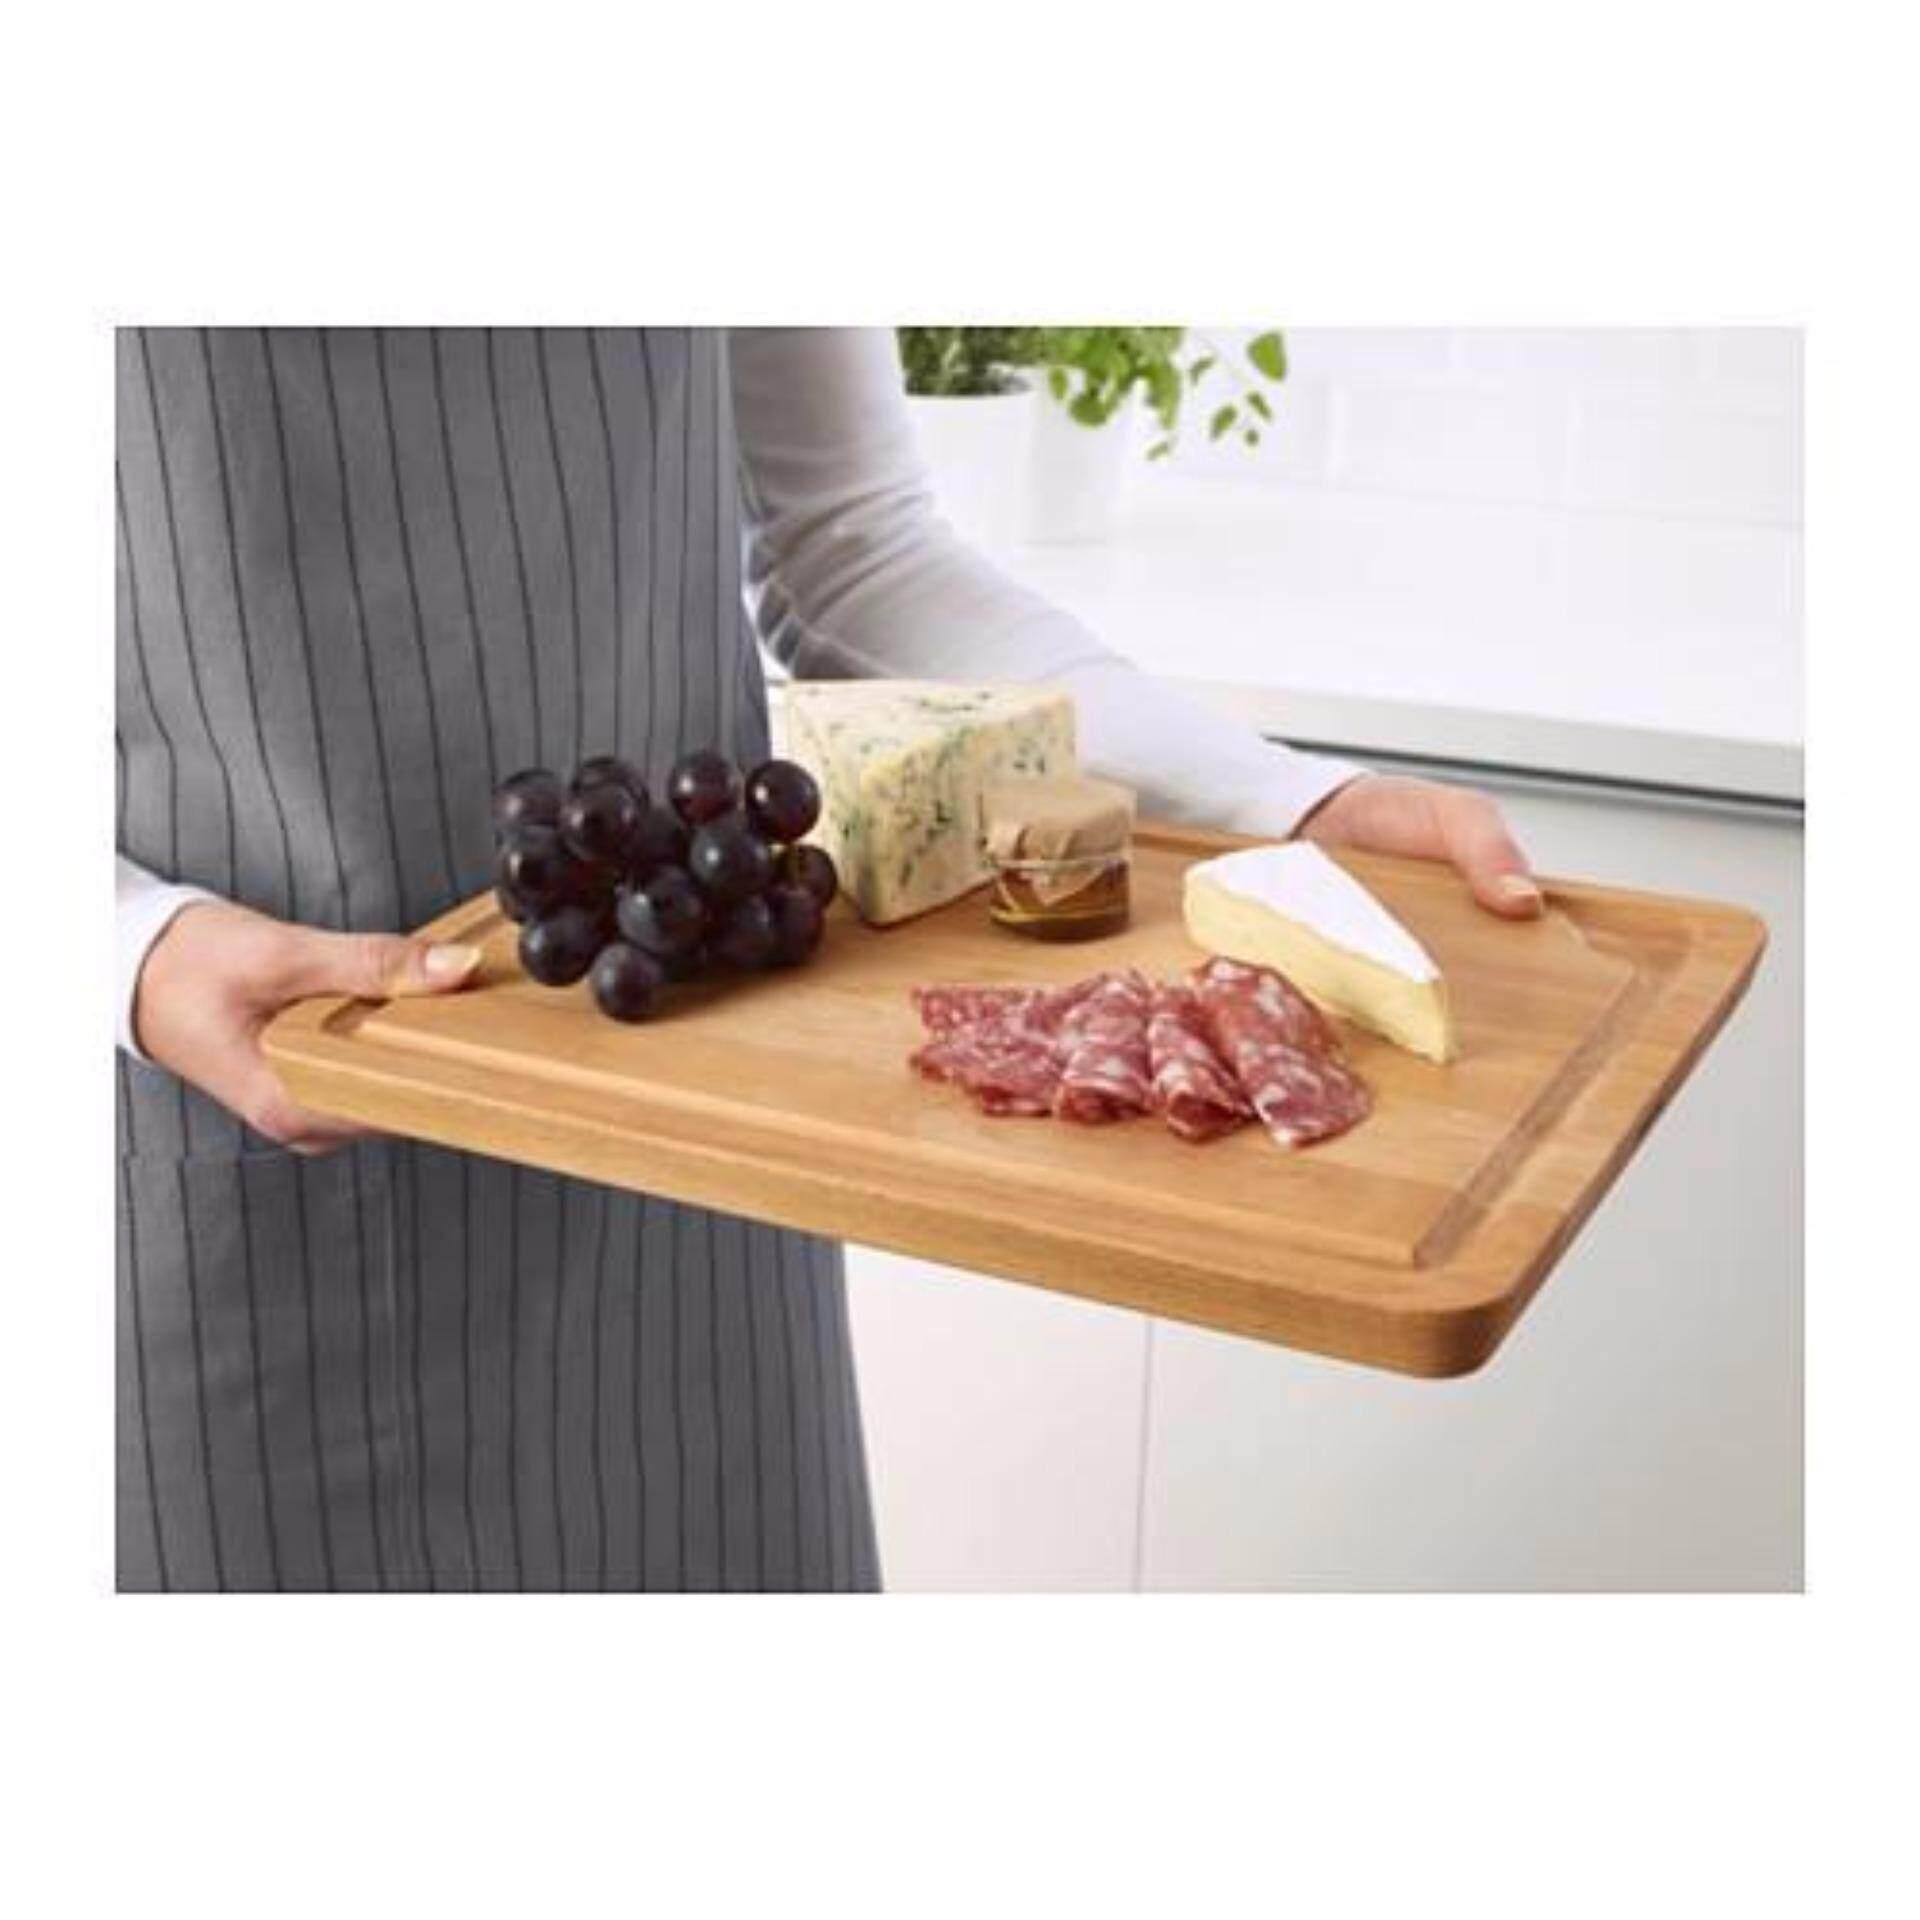 Ikea Multi Purpose Solid Wood Food Serving Tray Chopping Board 38x27 Cm